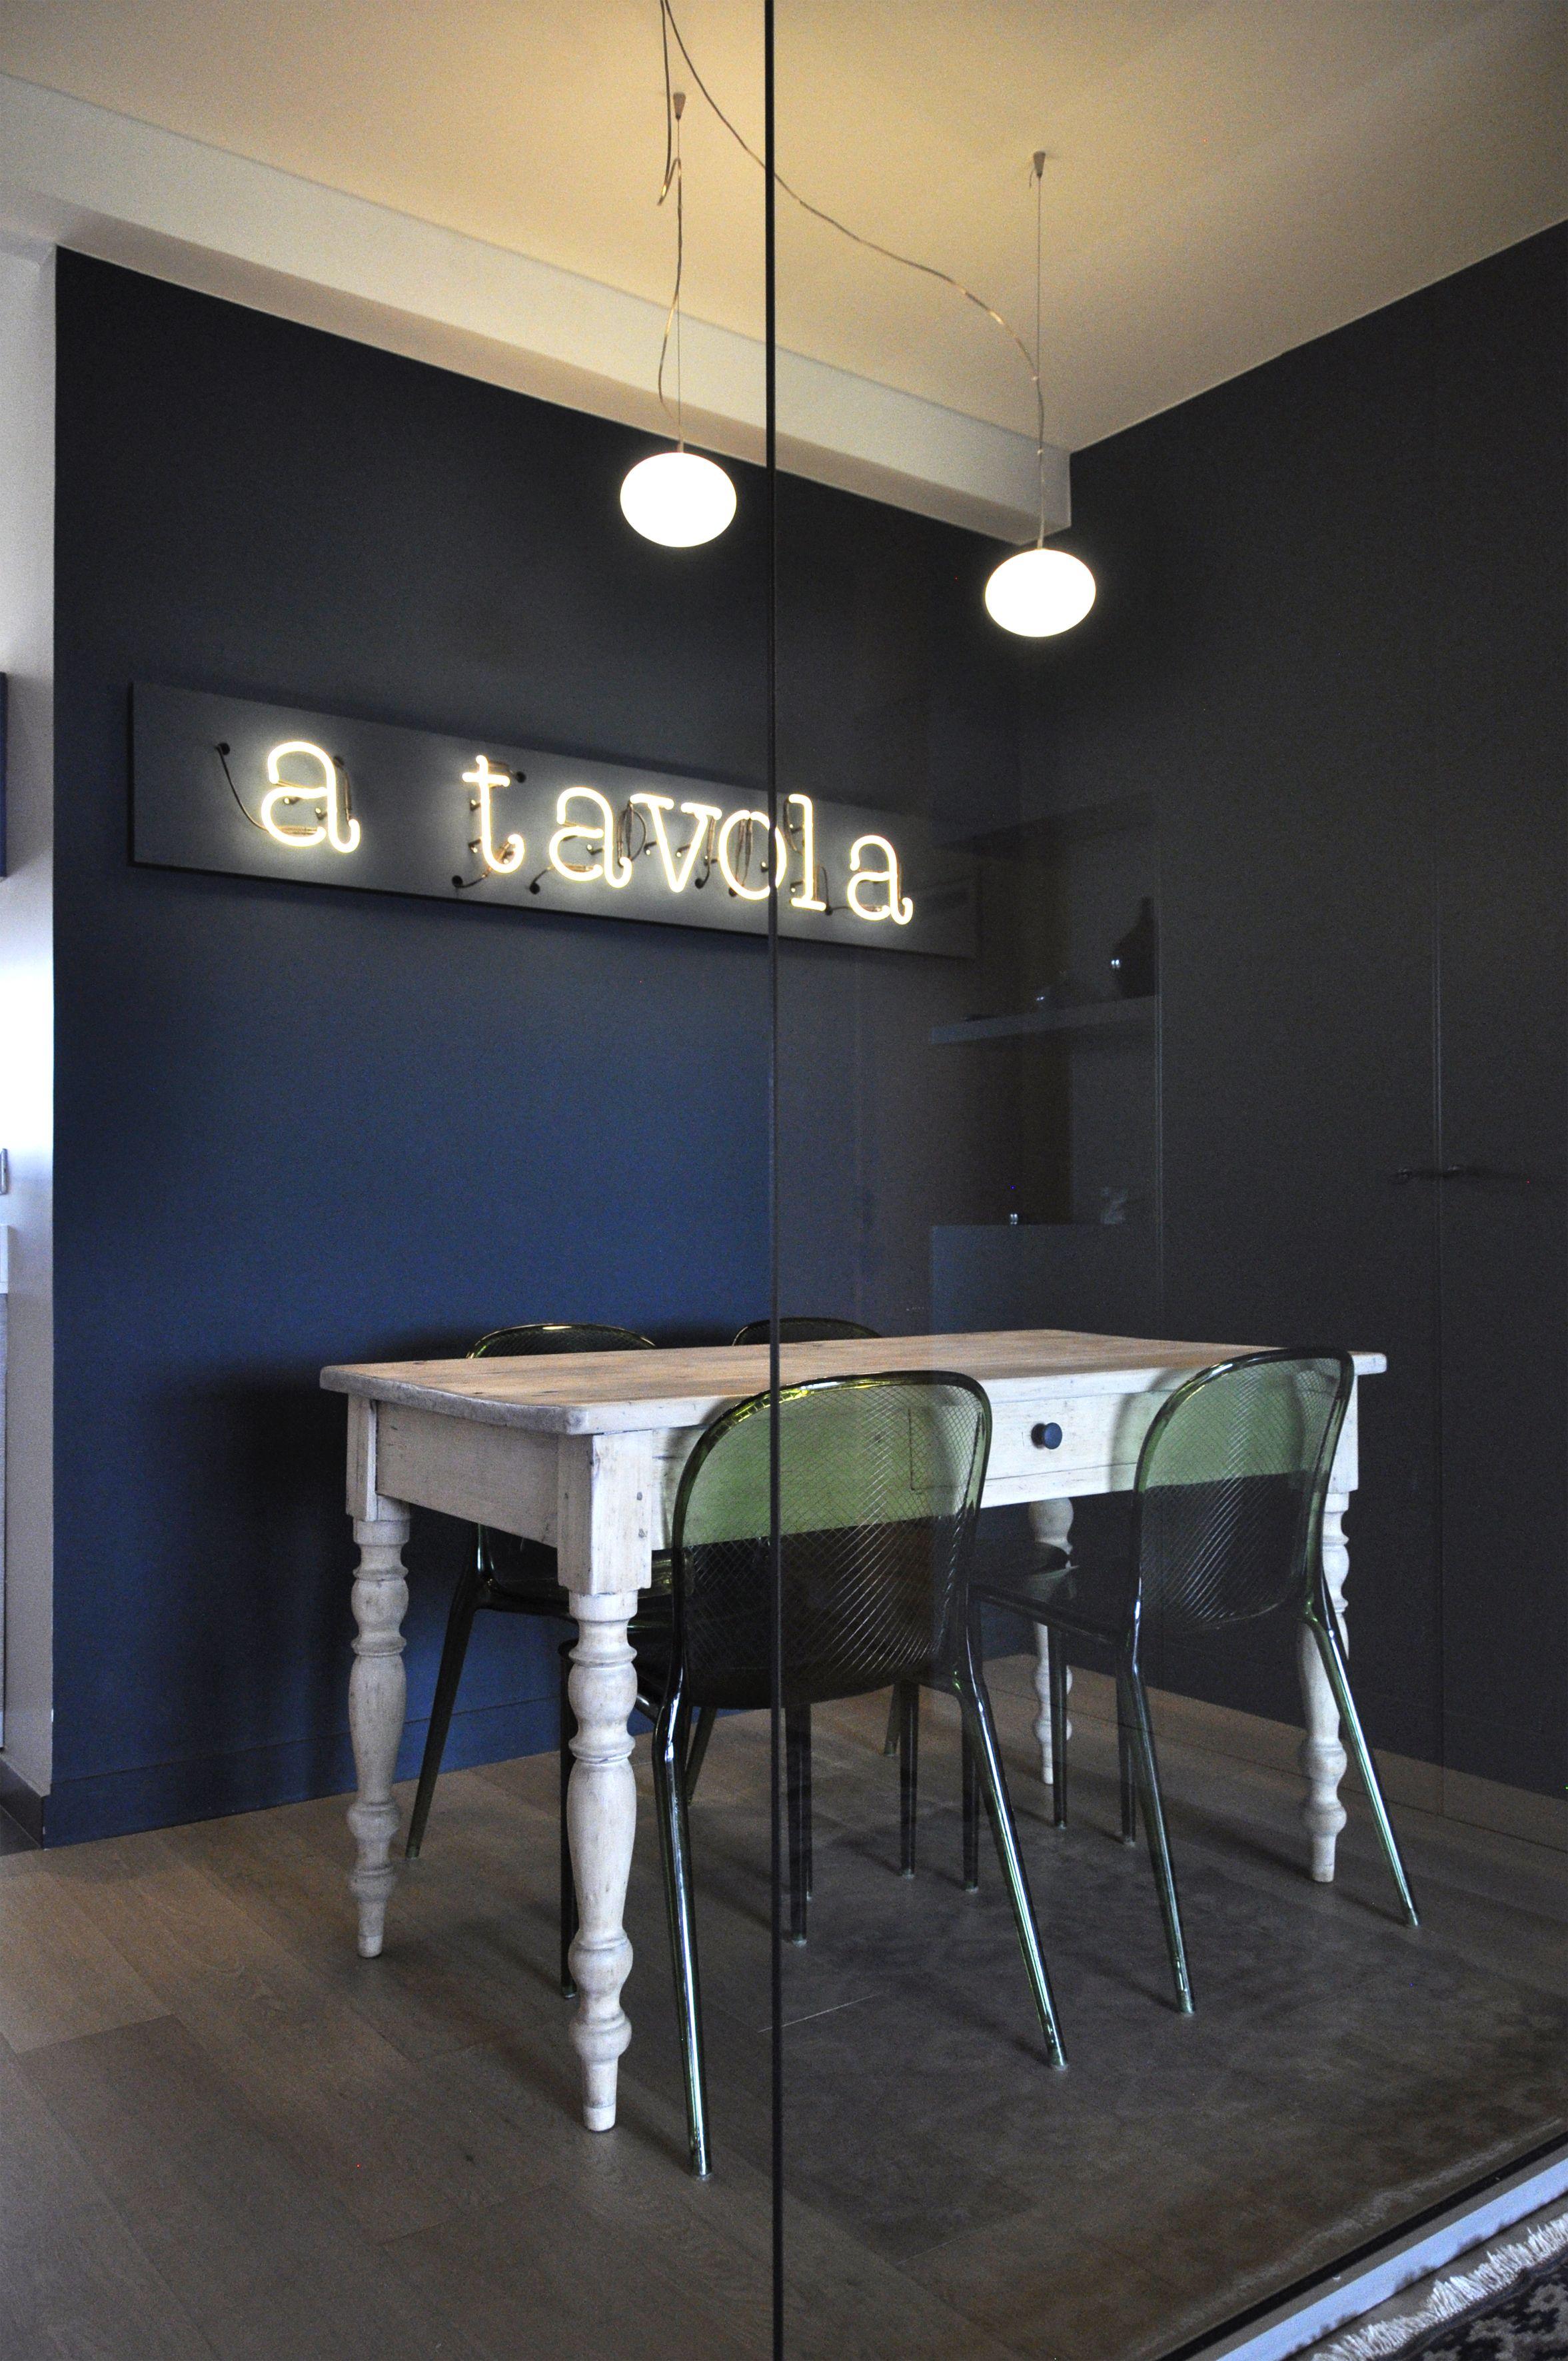 barbara s rencontre un archi mur bleu marine salle. Black Bedroom Furniture Sets. Home Design Ideas